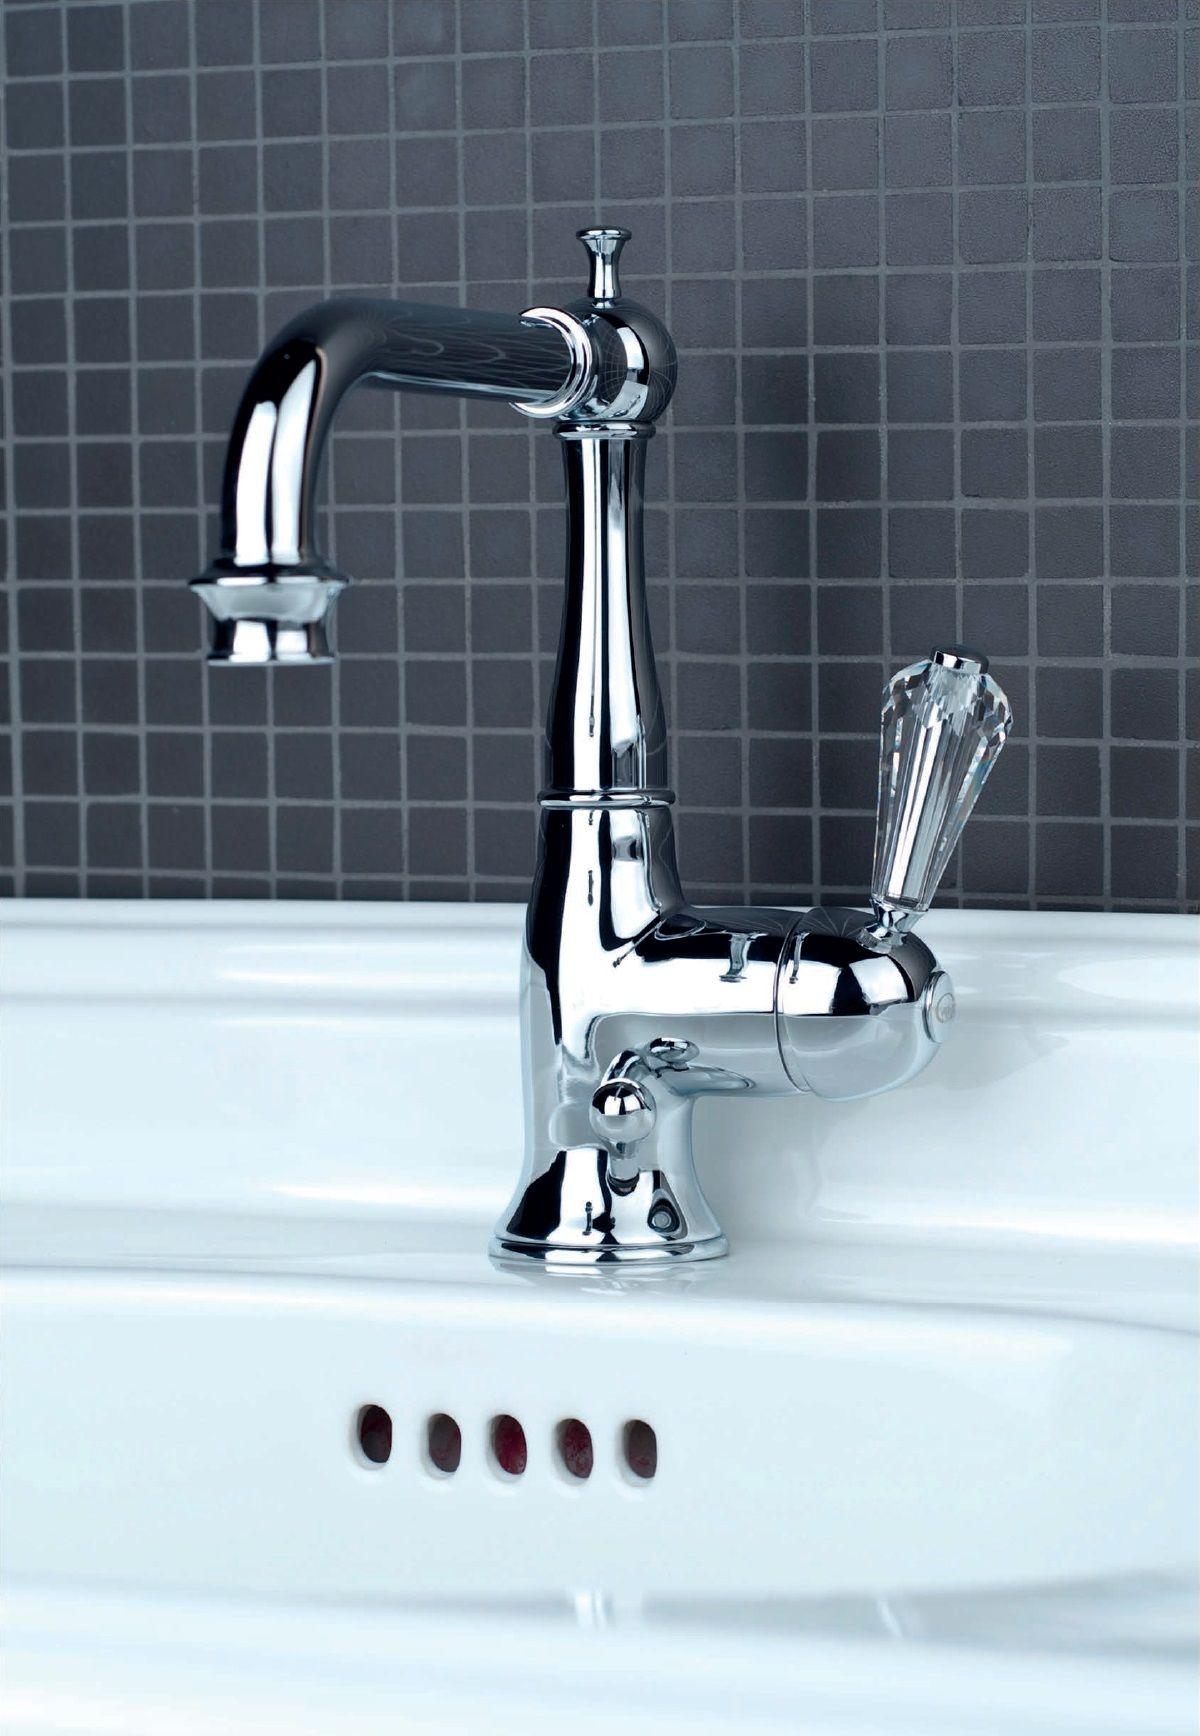 Rubinetteria Aston Rb6413 Rb19503 Gaiamobili Gaia Bathroom